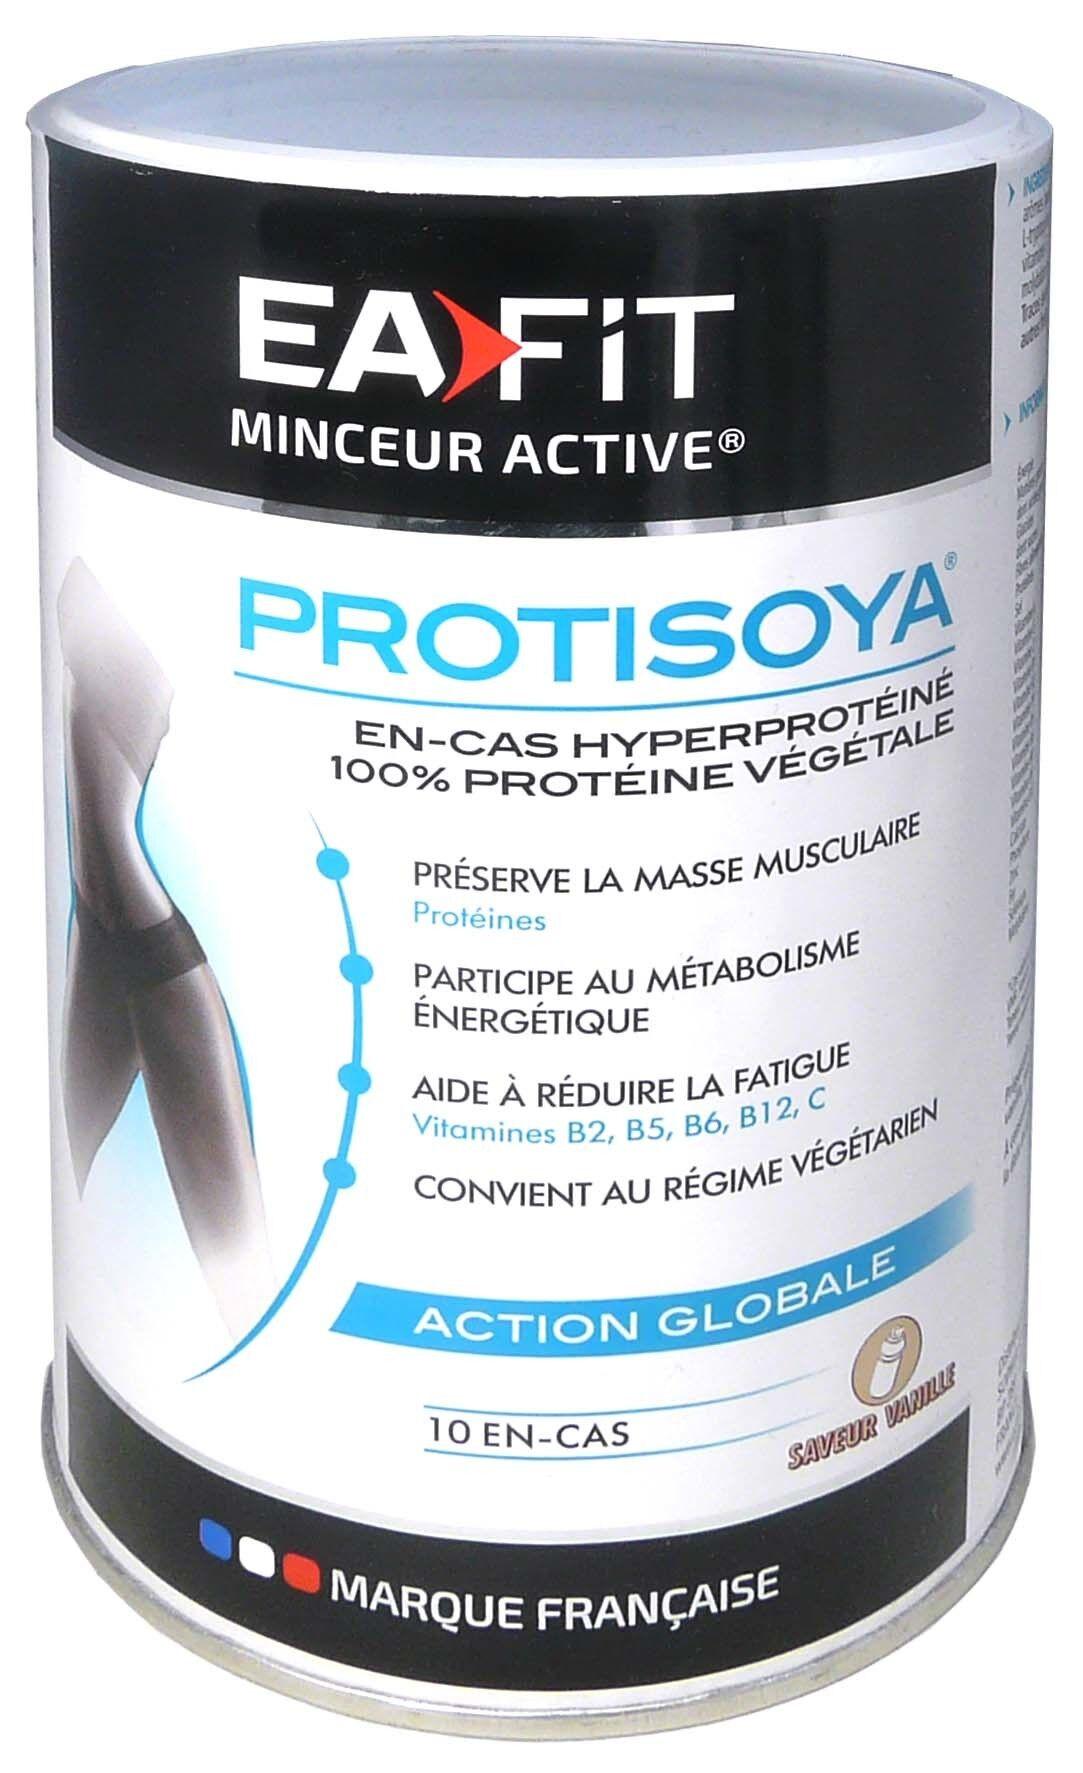 Eafit protisoya action globale gout vanille 320g